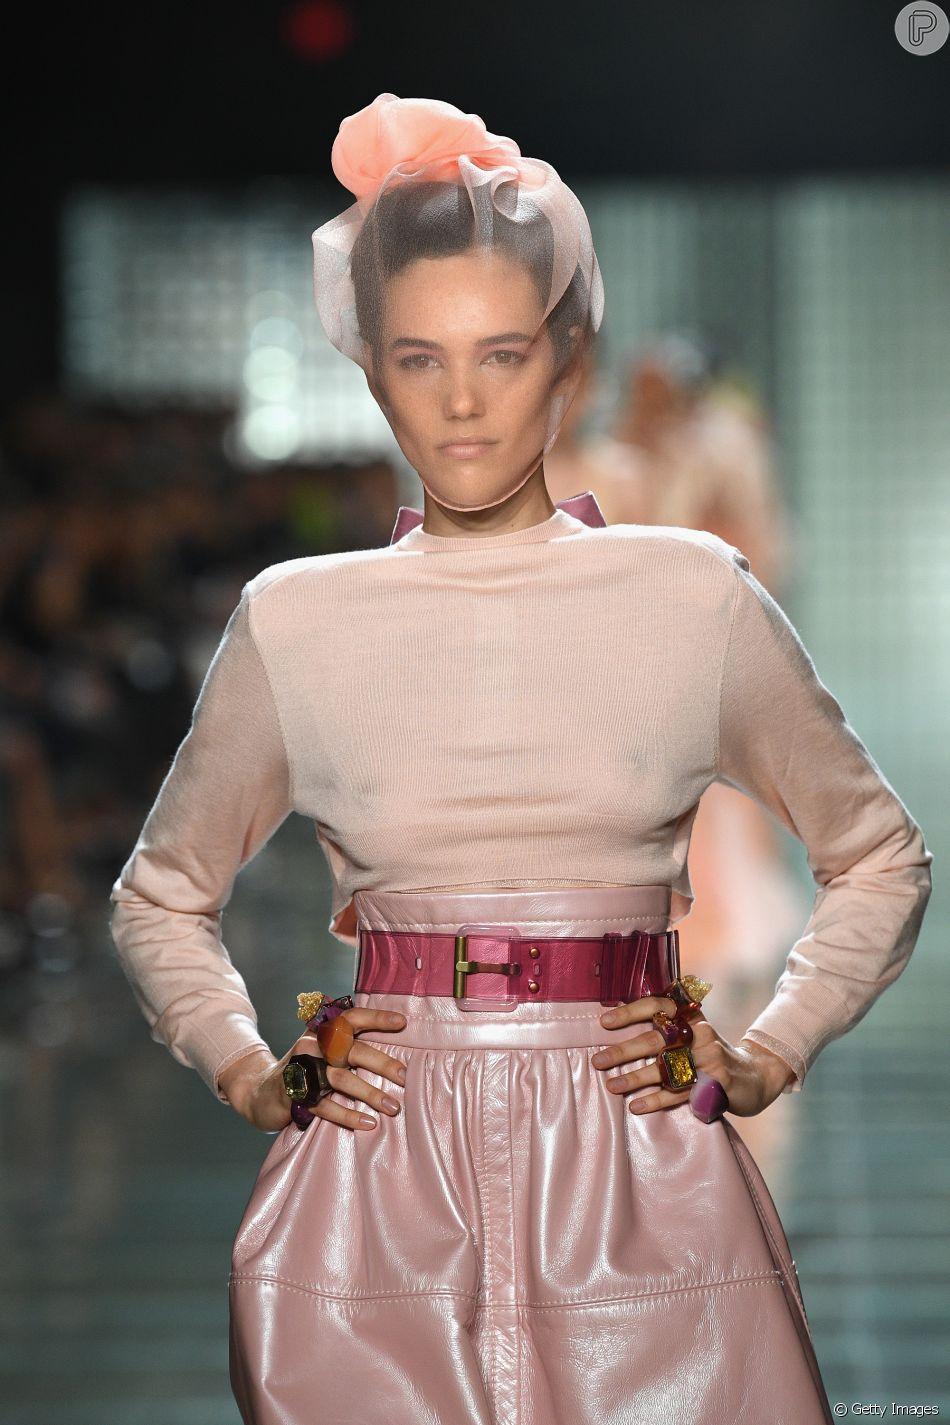 ce097b5a5 Transparência sem lingerie! No desfile de Marc Jacobs